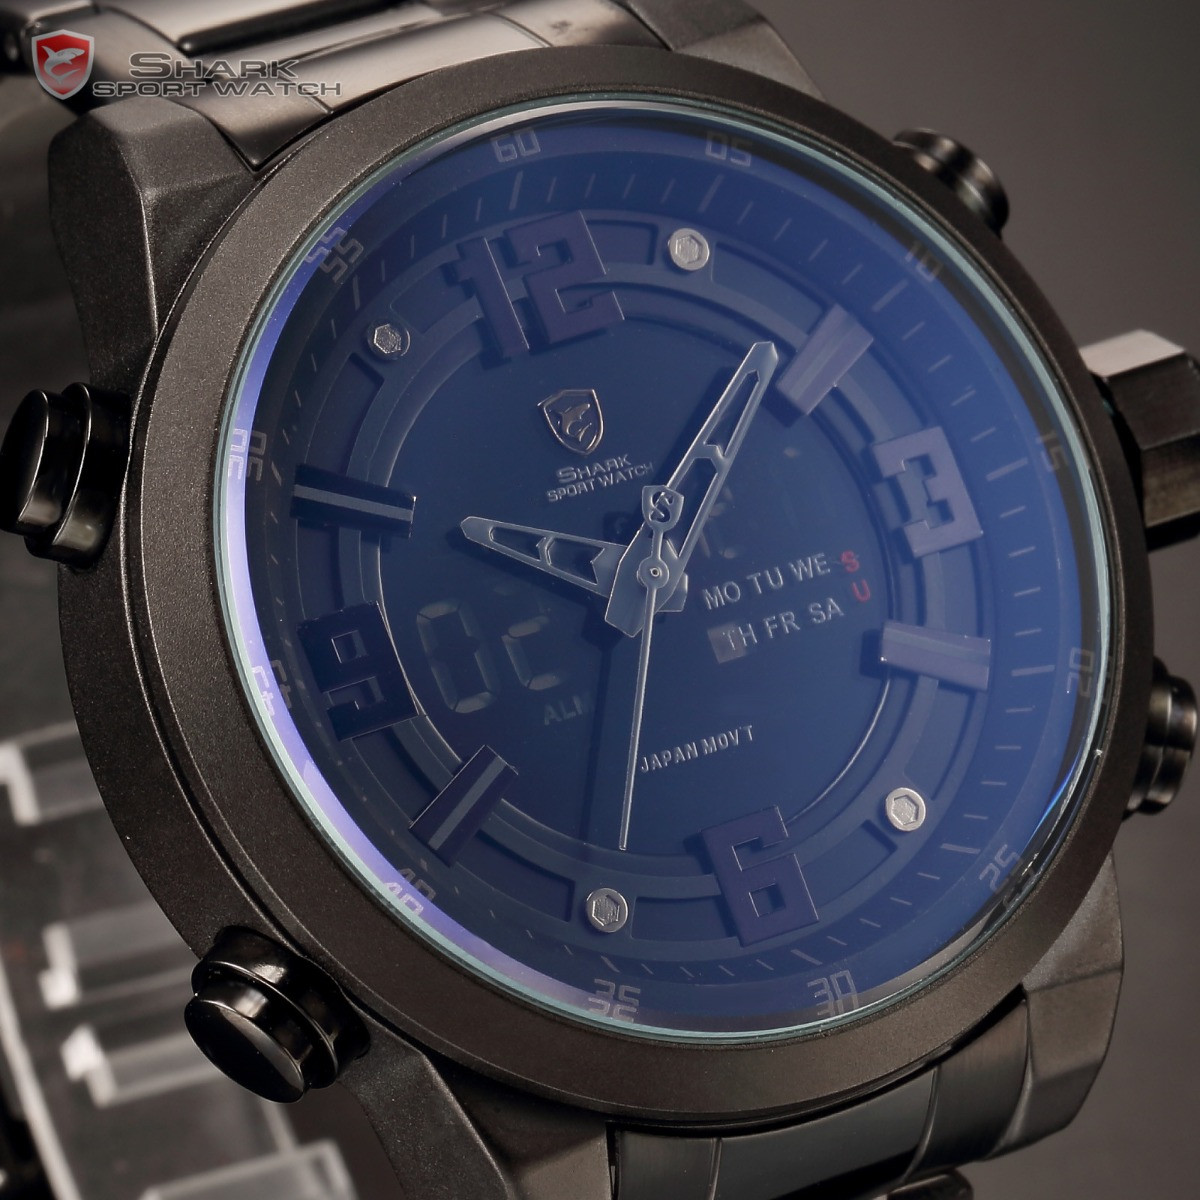 Мужские наручные часы Shark SH343 Black Men LCD Digital Steel Quart